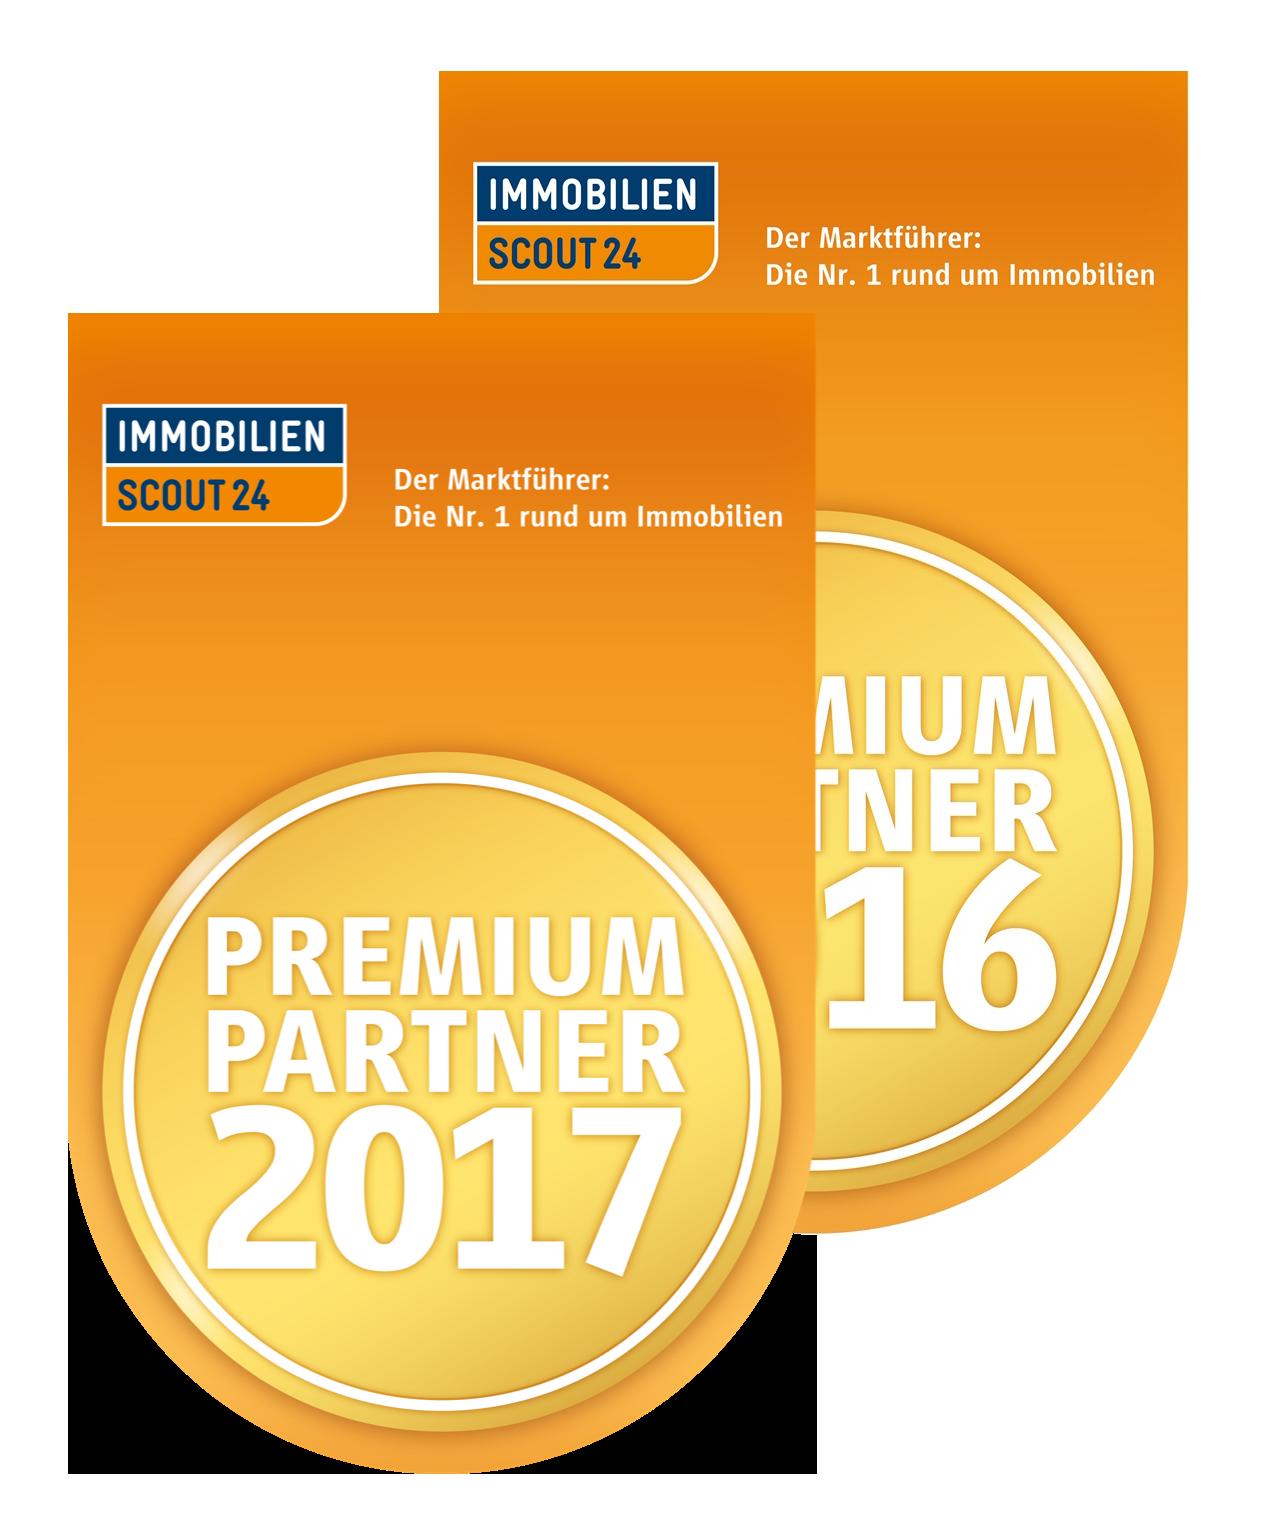 ImmobilienScout24 Premium Partner 2016 2017